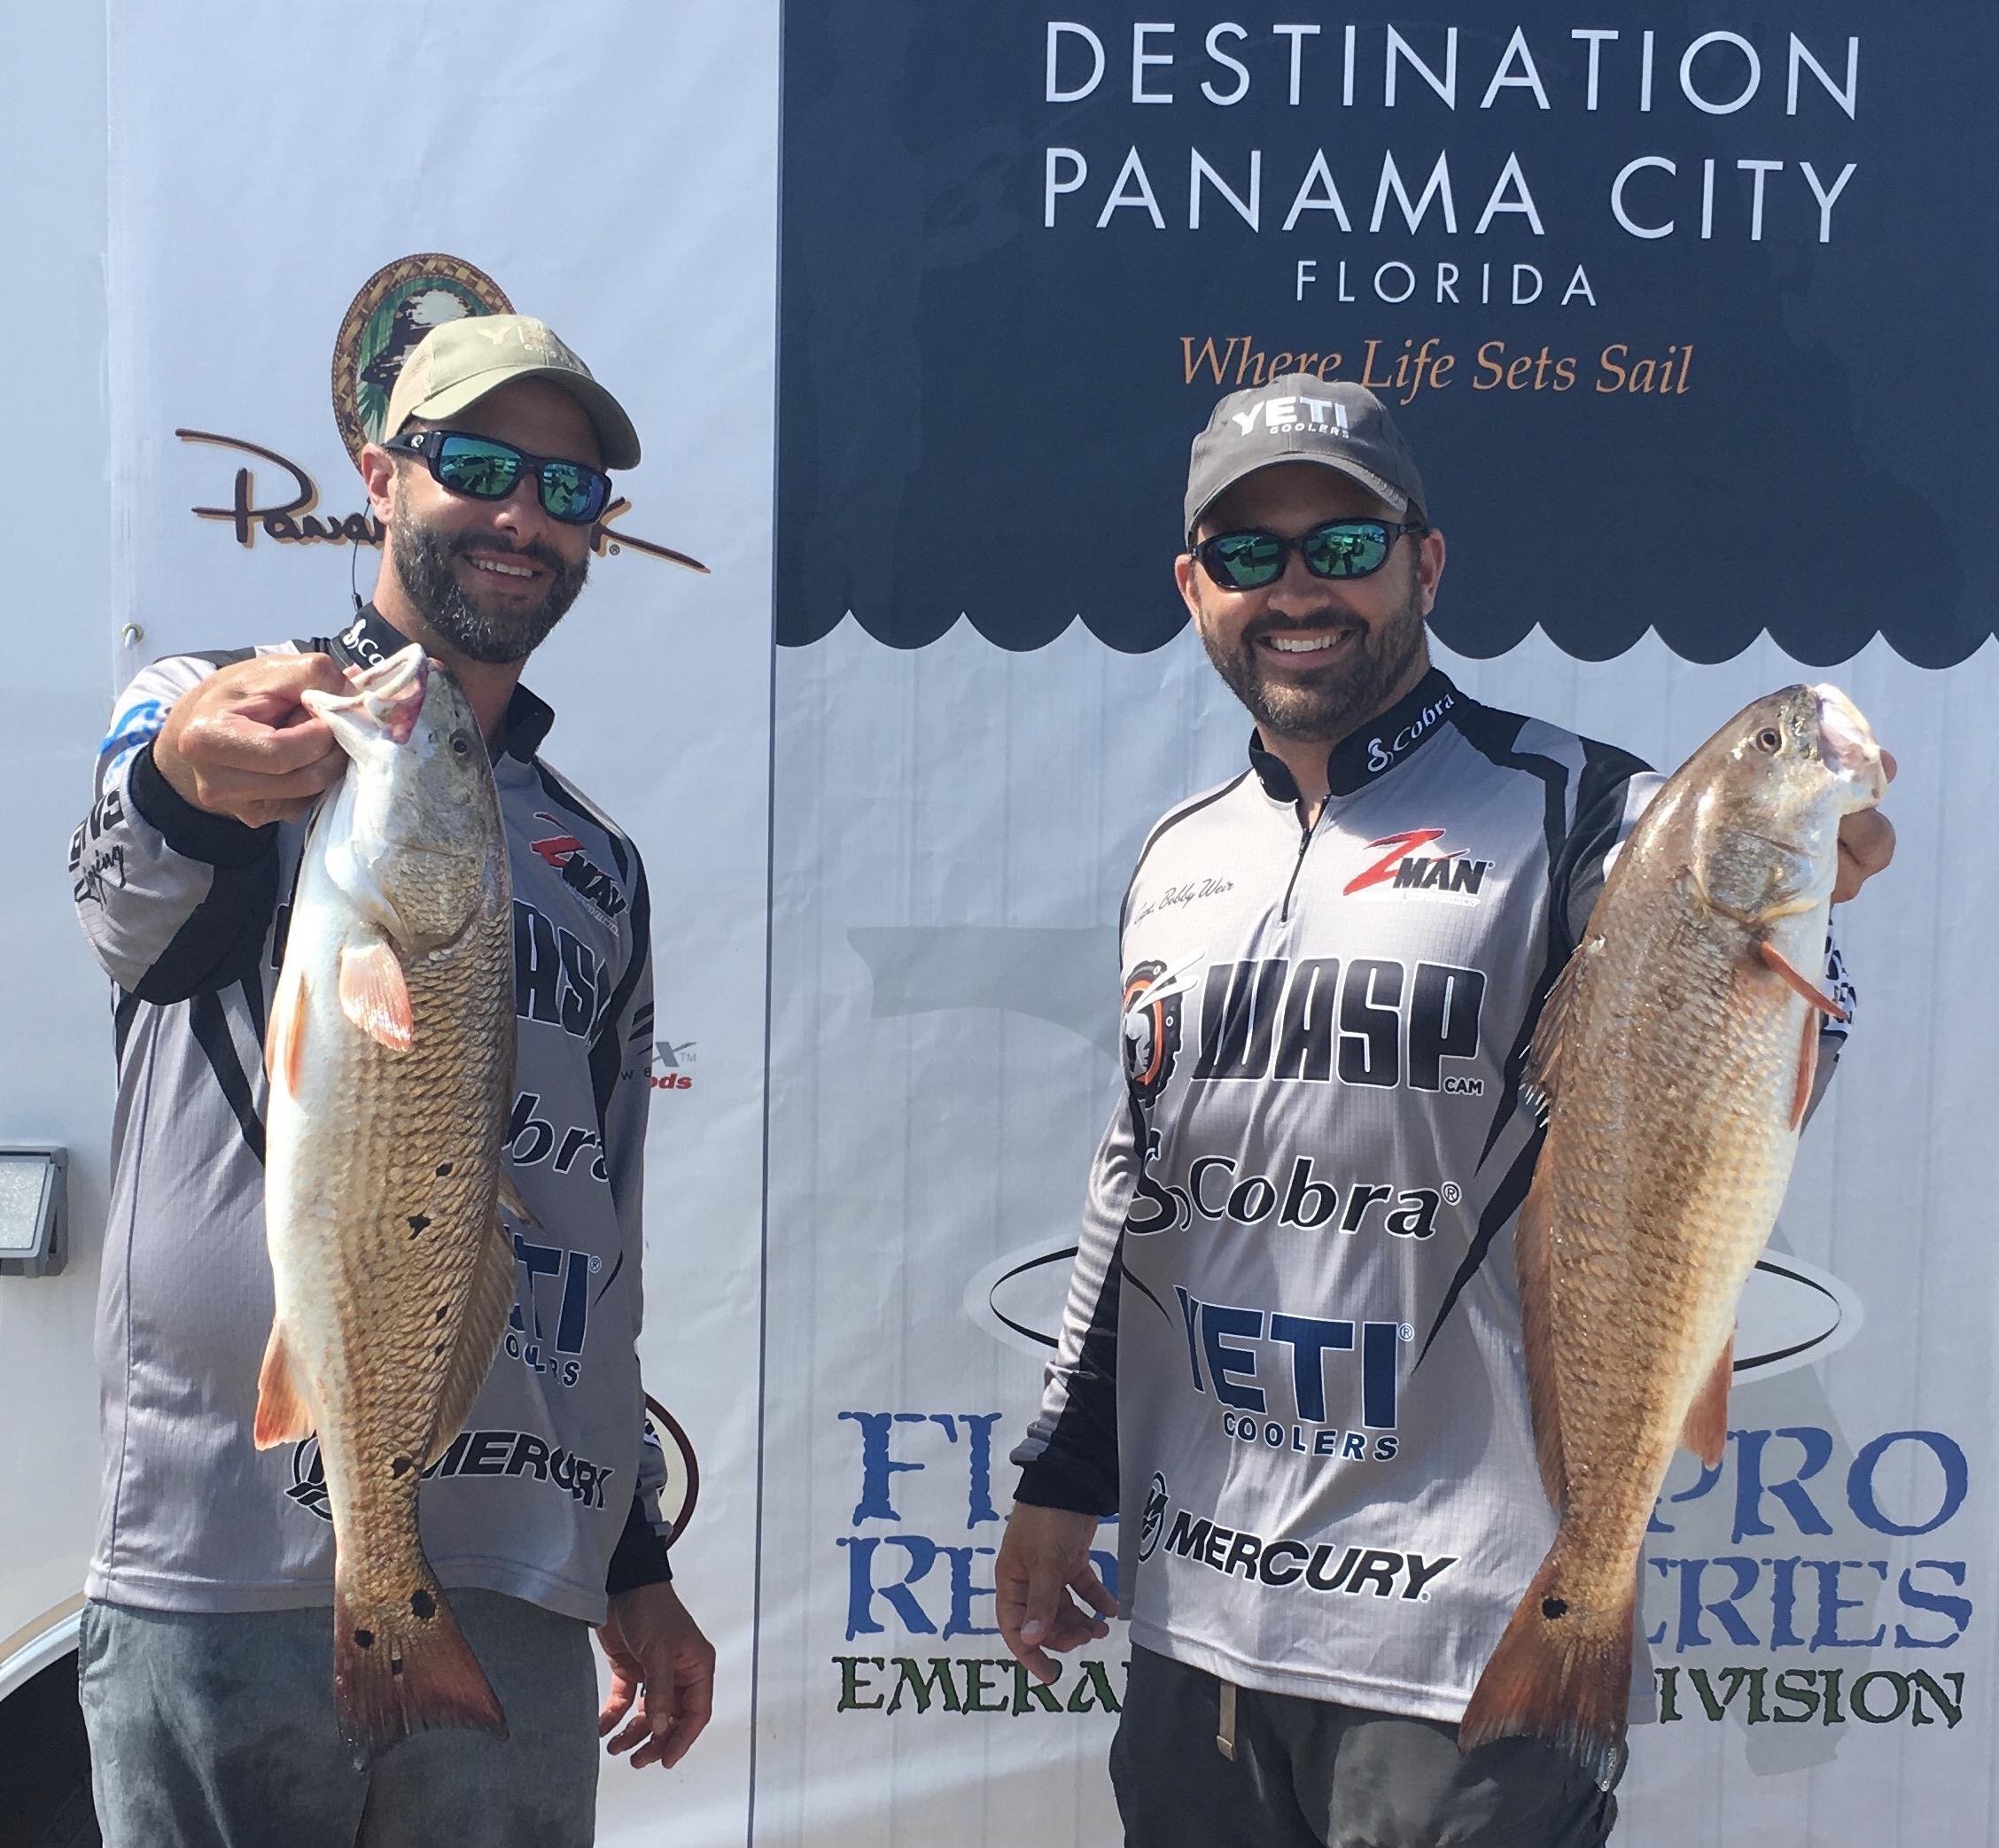 Local anglers Matt Schoen (l) and Bobby Weir (R) of Santa Rosa Beach, Florida